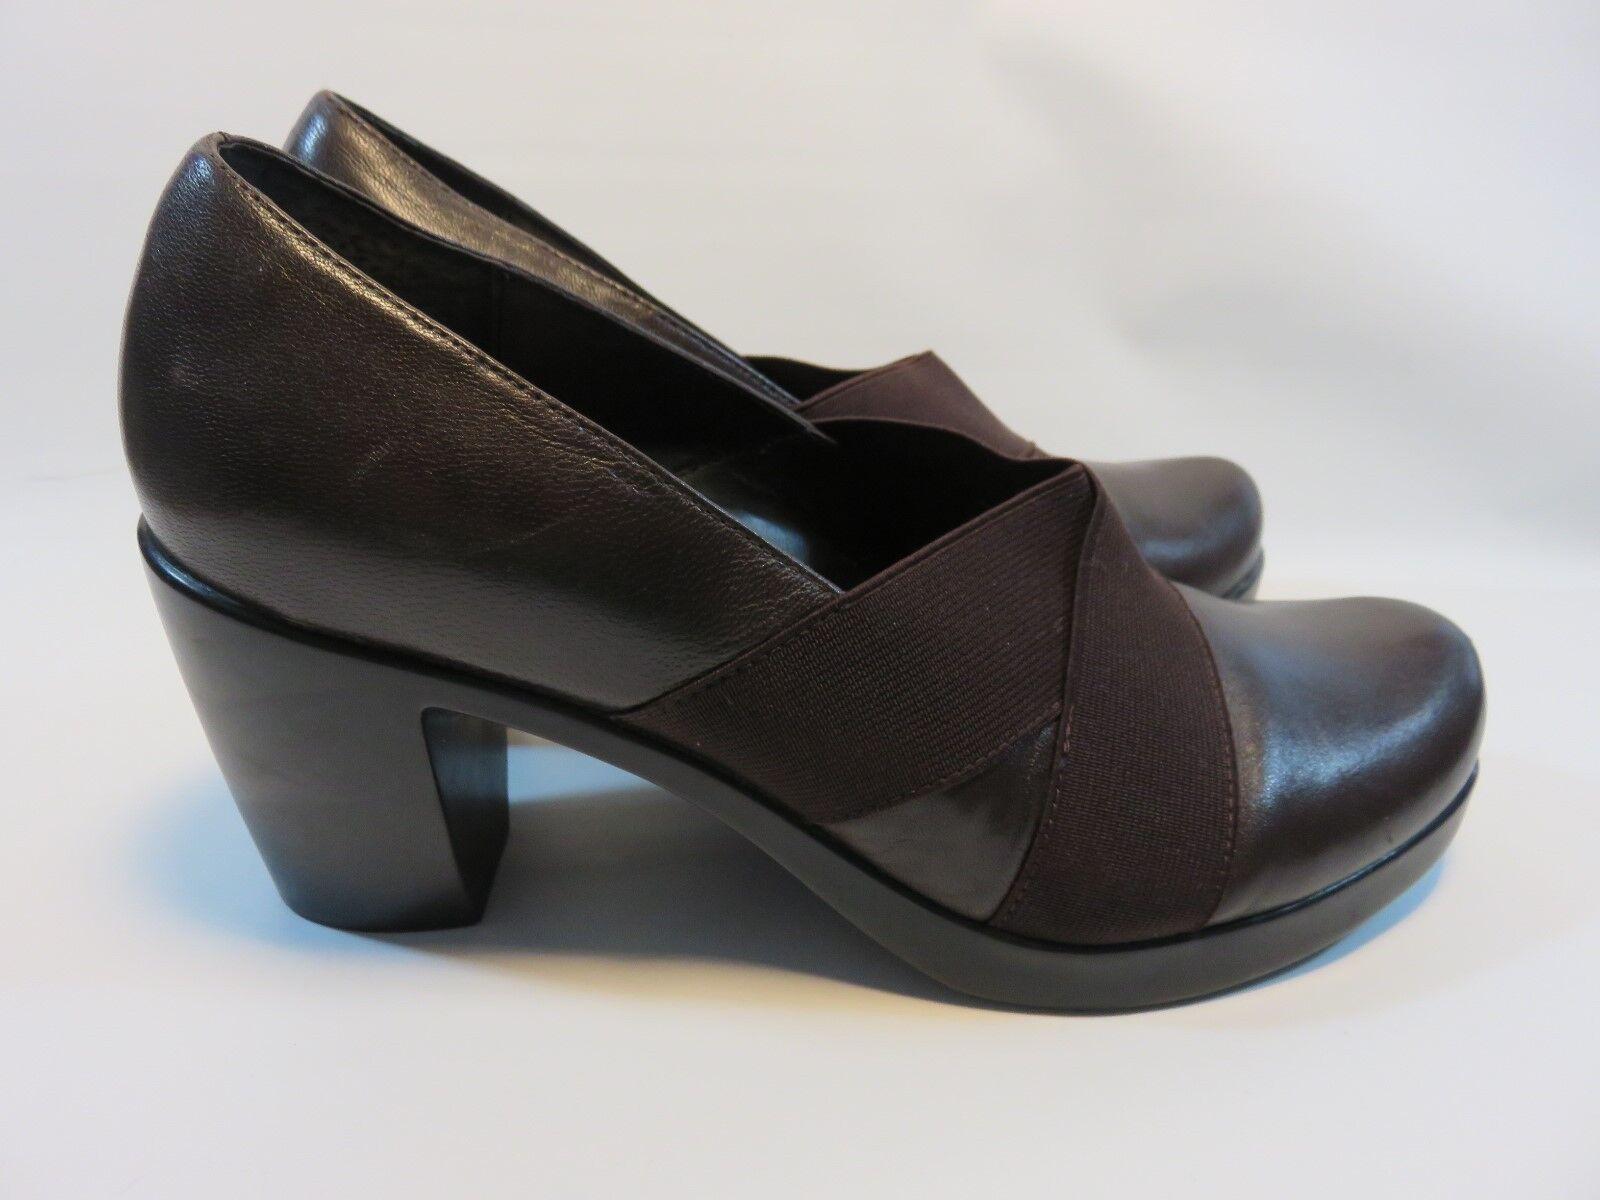 DANSKO Chocolate Brown Classic Leather Heels Women's Size 38.5 EUC